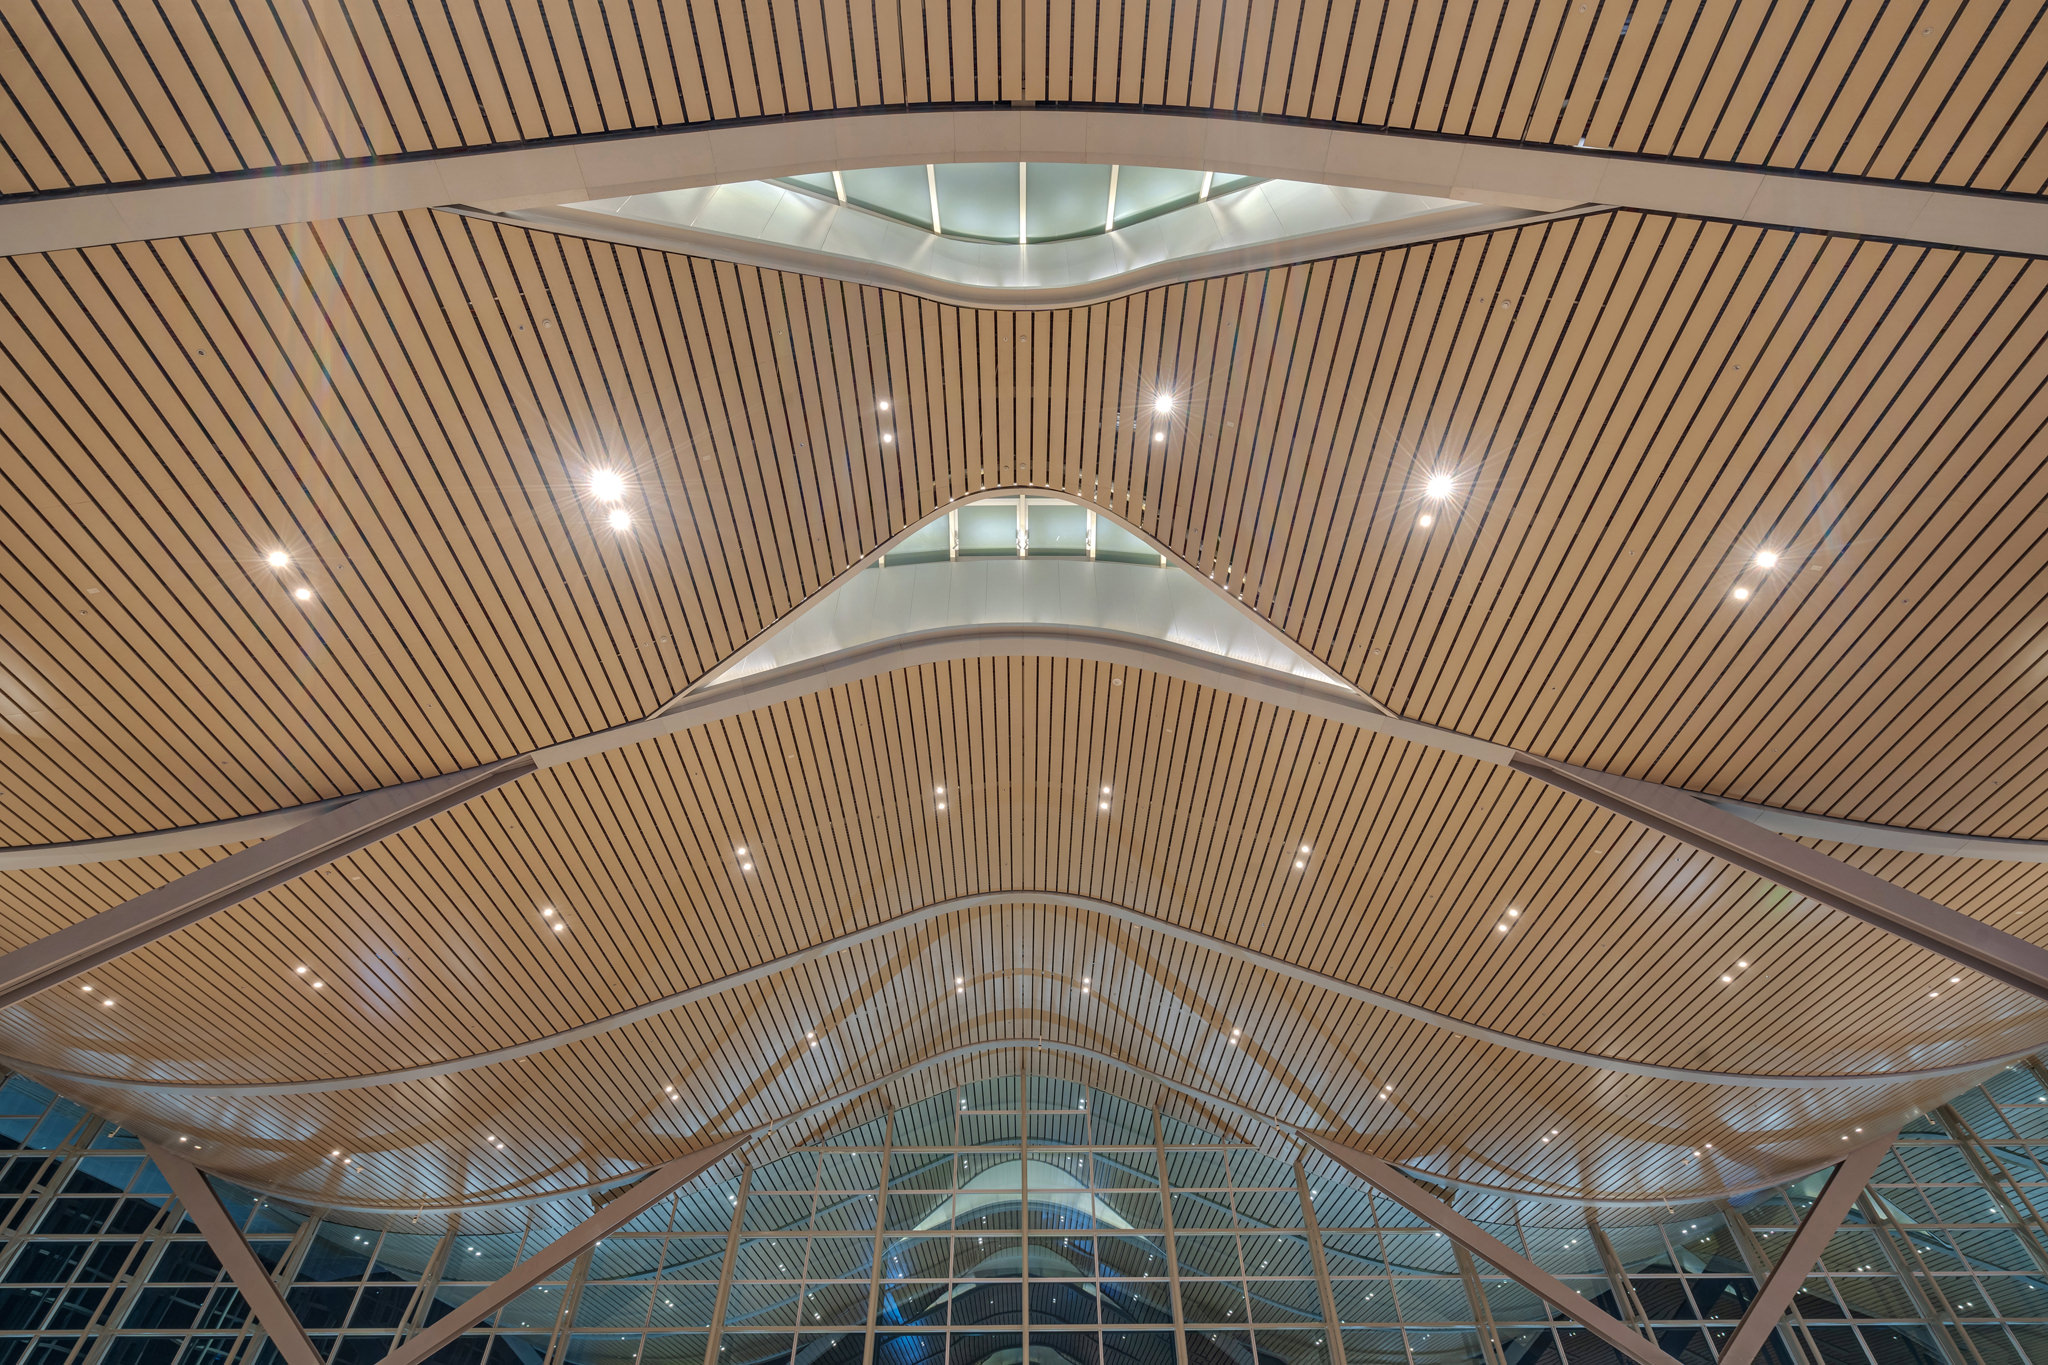 20180626 - Cam Ranh Airport - Architecture - 0442.jpg